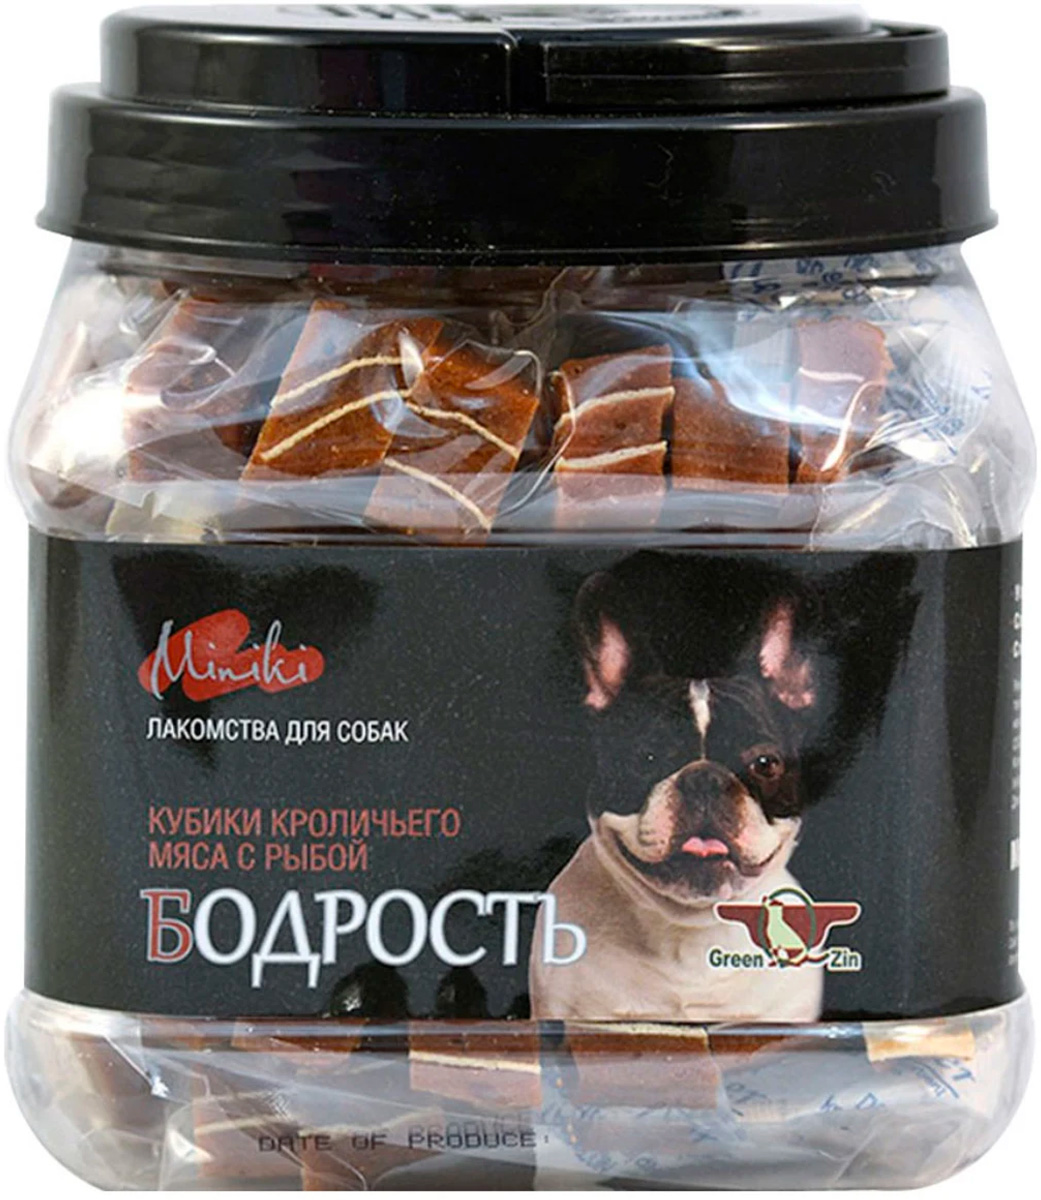 Лакомство Green Qzin Miniki Бодрость для собак маленьких пород кубики мяса кролика с сурими 630 гр (1 шт)